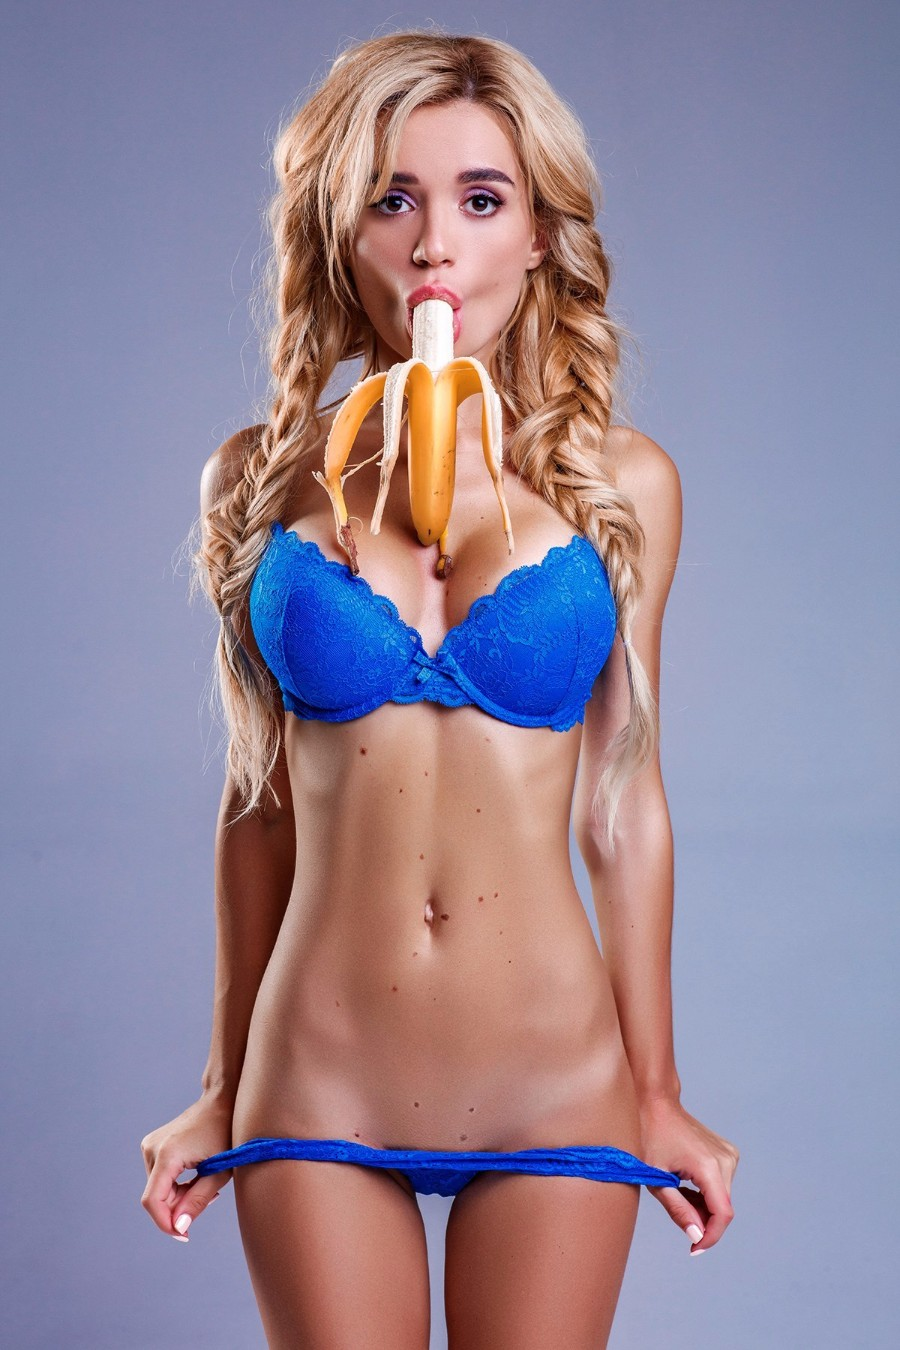 С бананом во рту